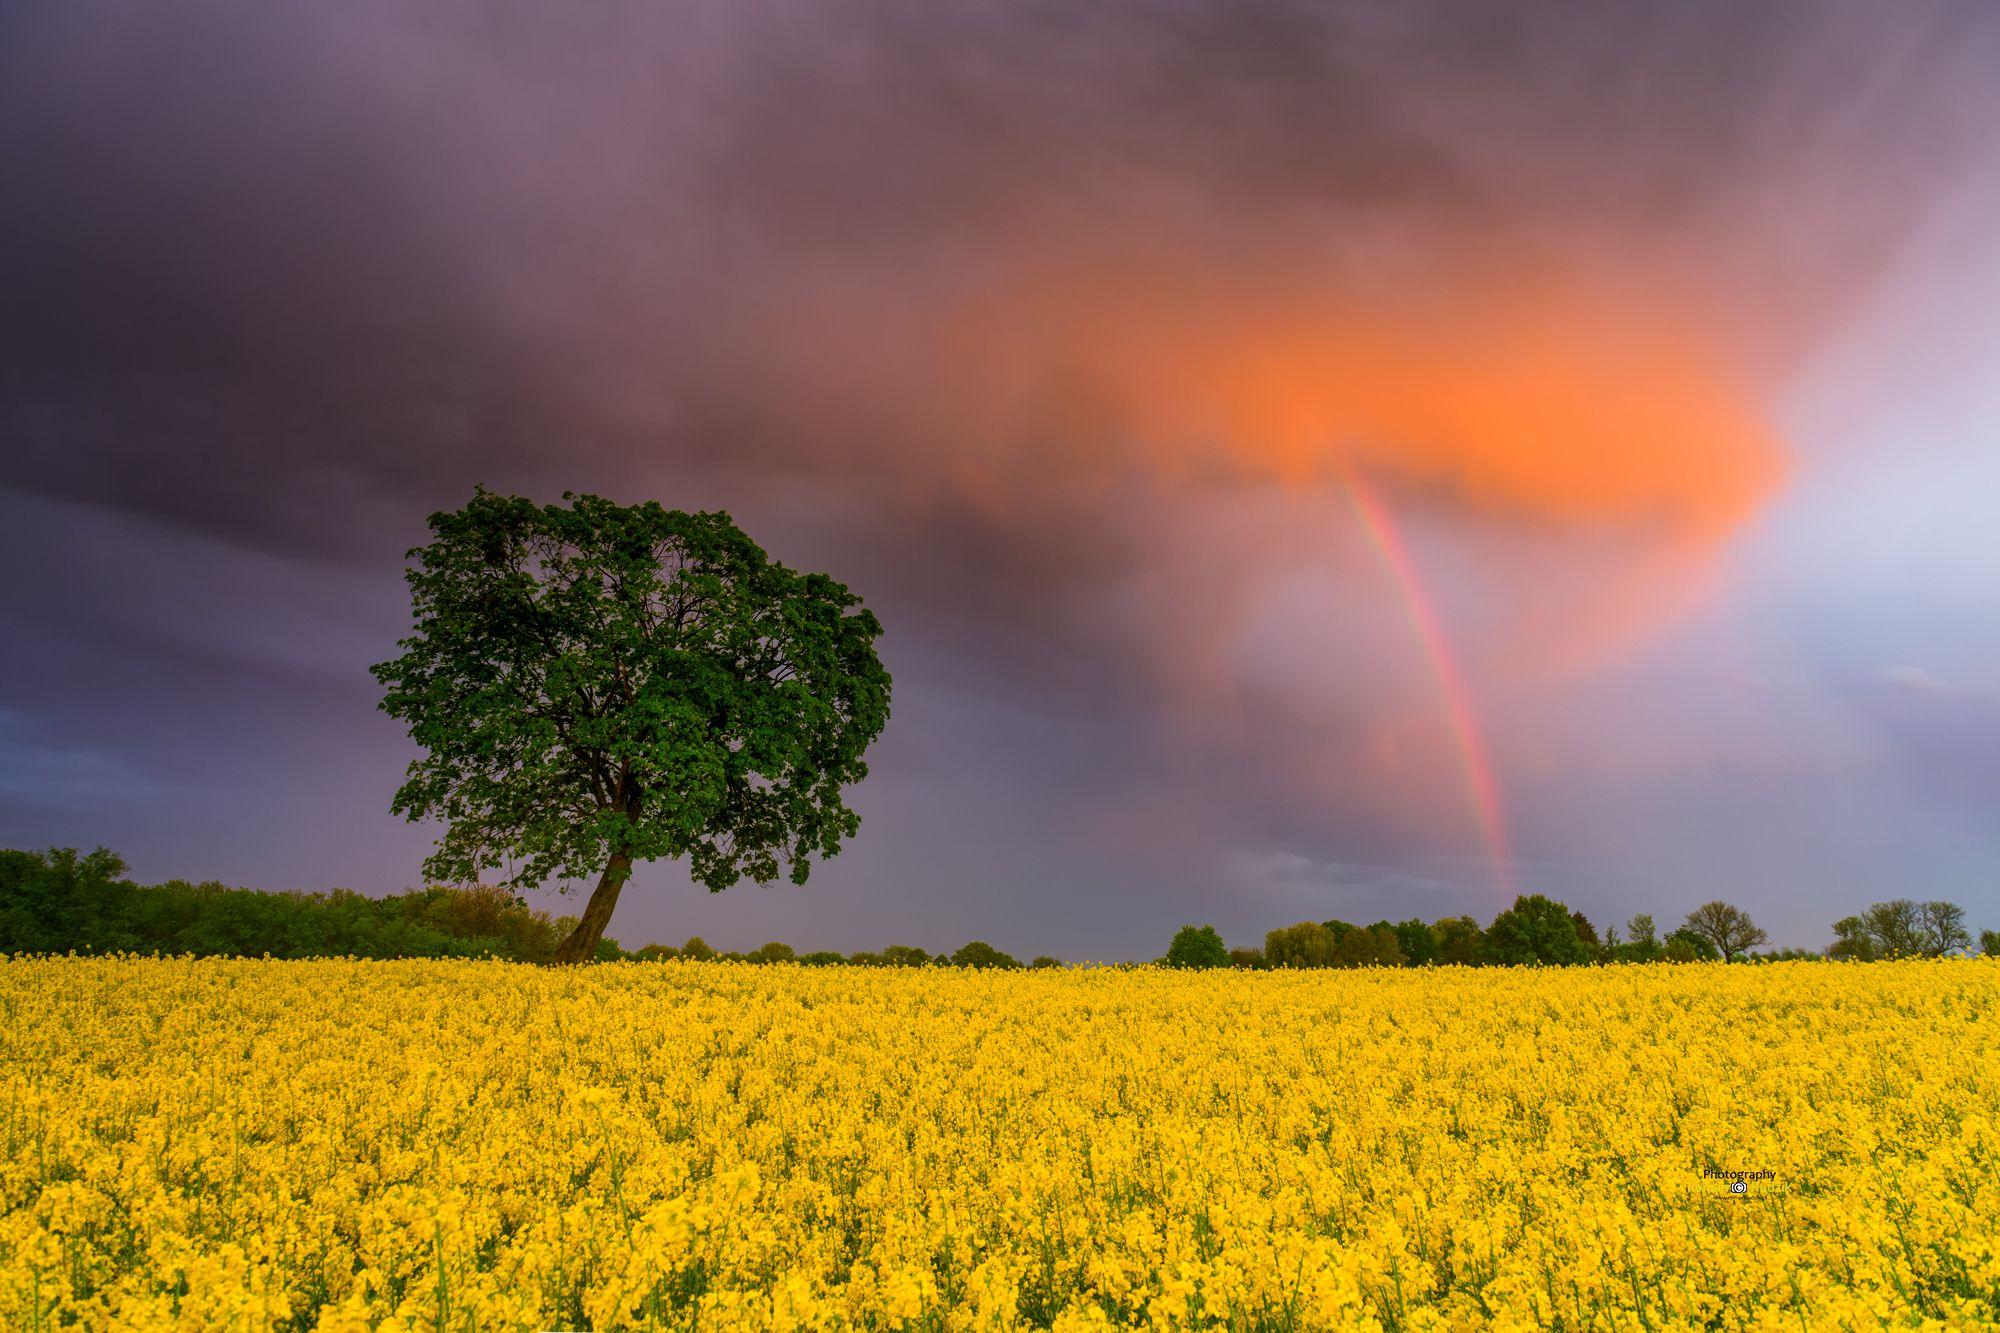 sunset, rainbow, landscape, Poland, Kociewie, clouds, sky, rape, fields, Hudzik Roman